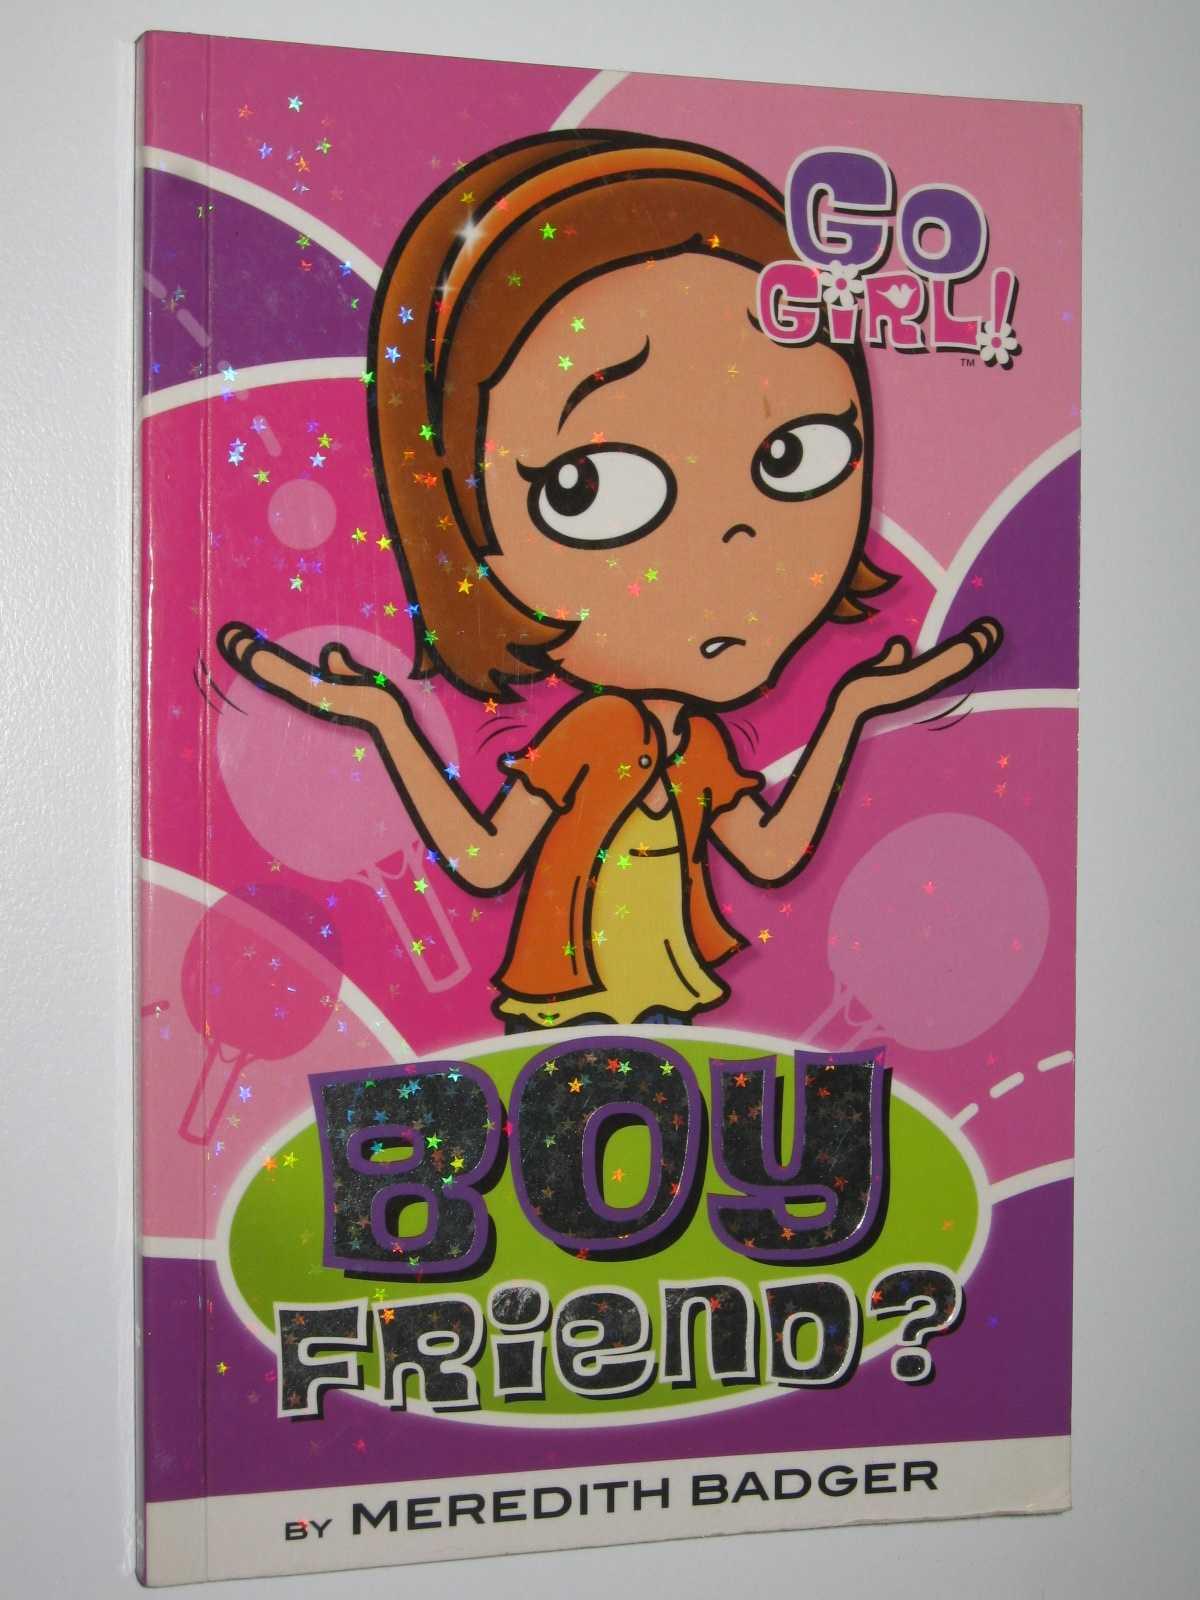 Boy Friend? - Go Girl! #23, Badger, Meredith